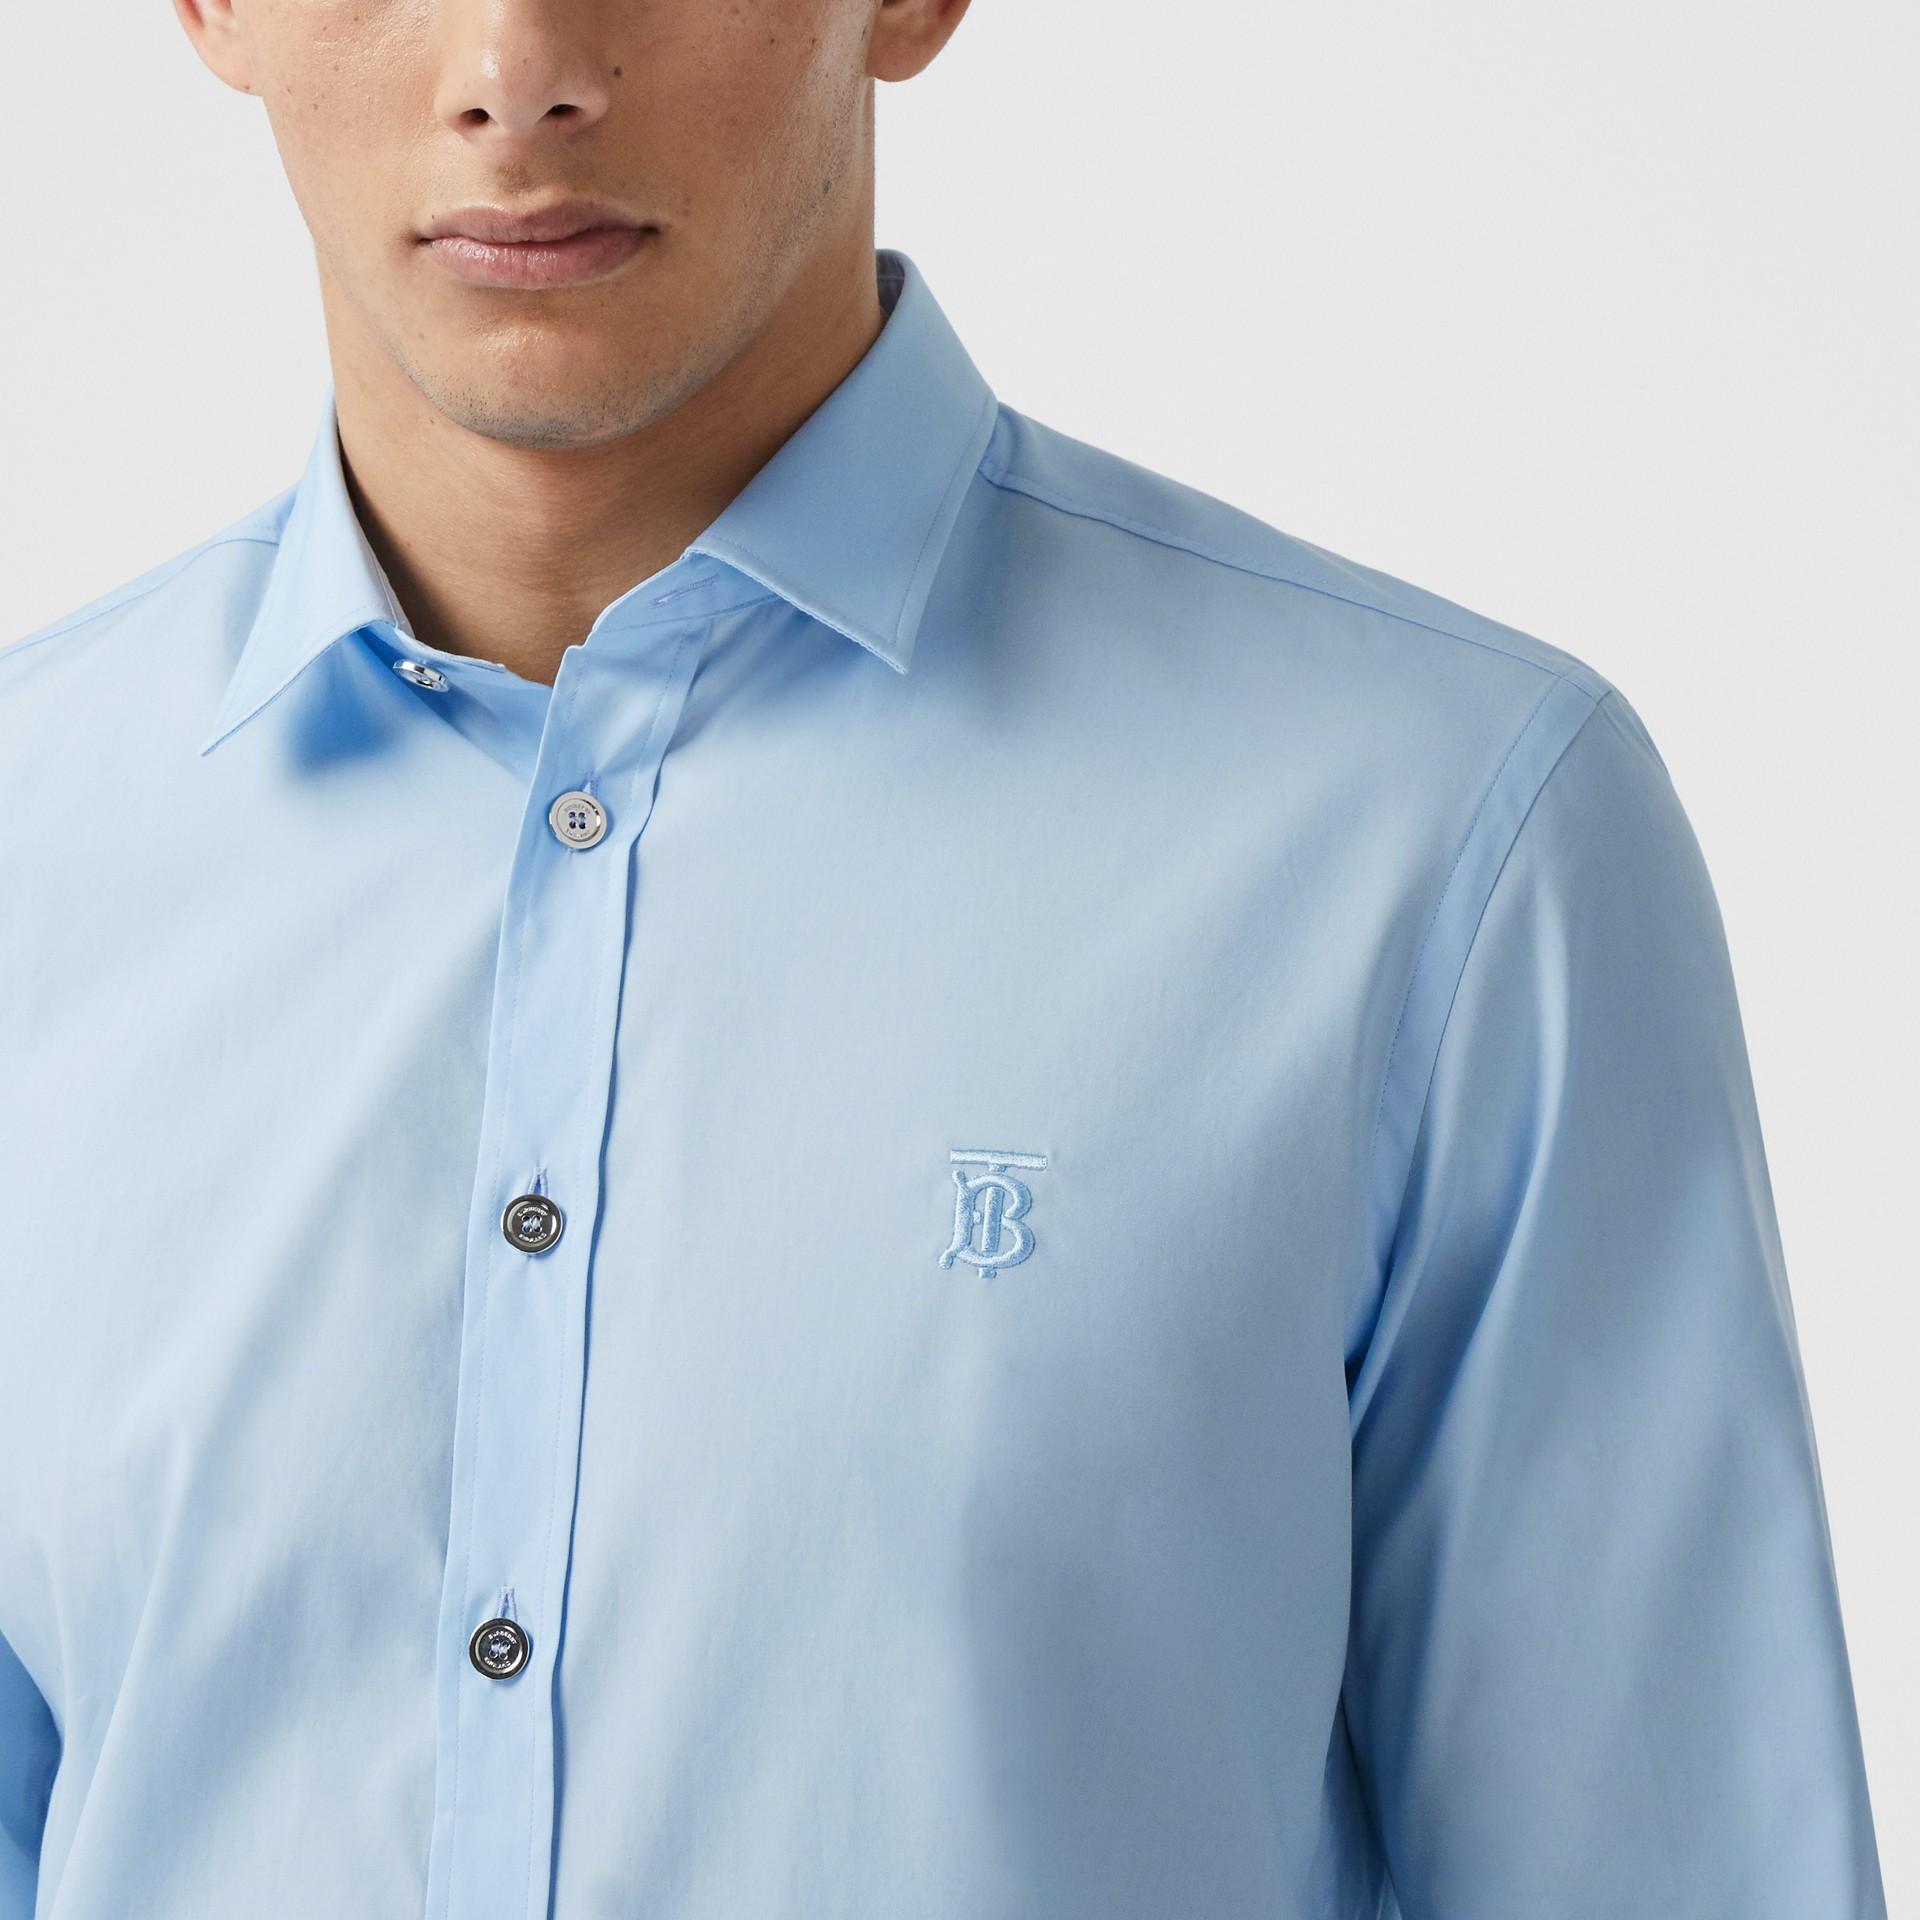 Monogram Motif Stretch Cotton Poplin Shirt in Pale Blue - Men   Burberry Australia - gallery image 1